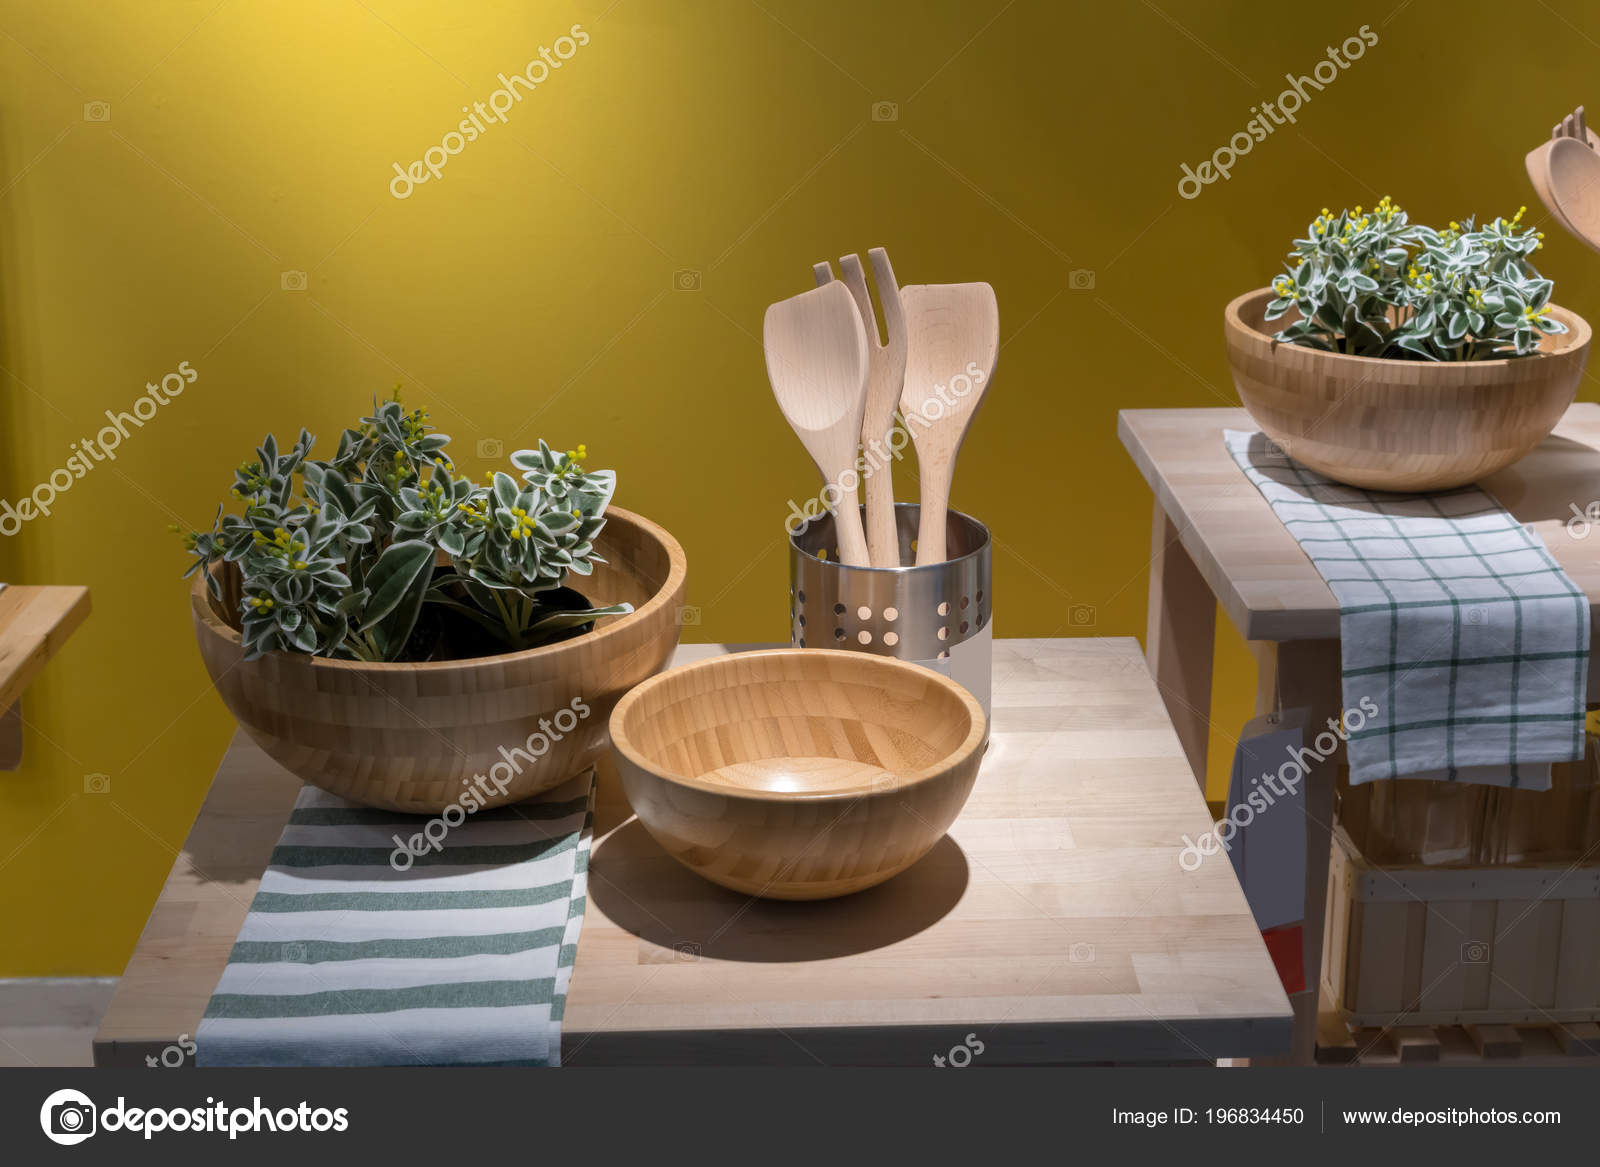 kitchen island carts cabinets omaha 为家居设计和装饰而关闭木岛厨房推车上的厨具黄色背景 图库照片 c v74 为家居设计和装饰而关闭木岛厨房推车上的厨具黄色